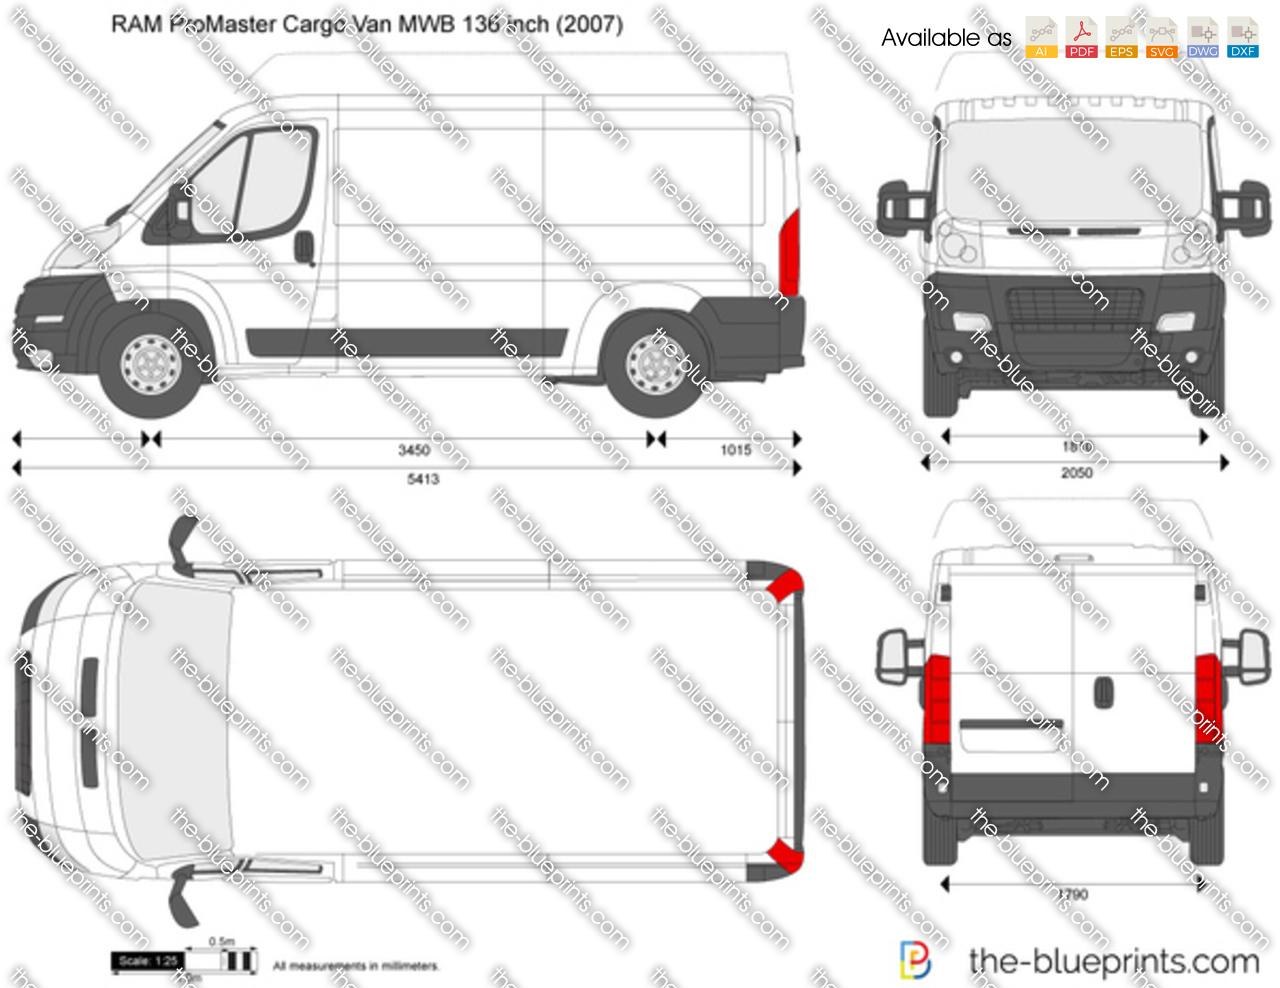 RAM ProMaster Cargo Van MWB 136 inch vector drawing